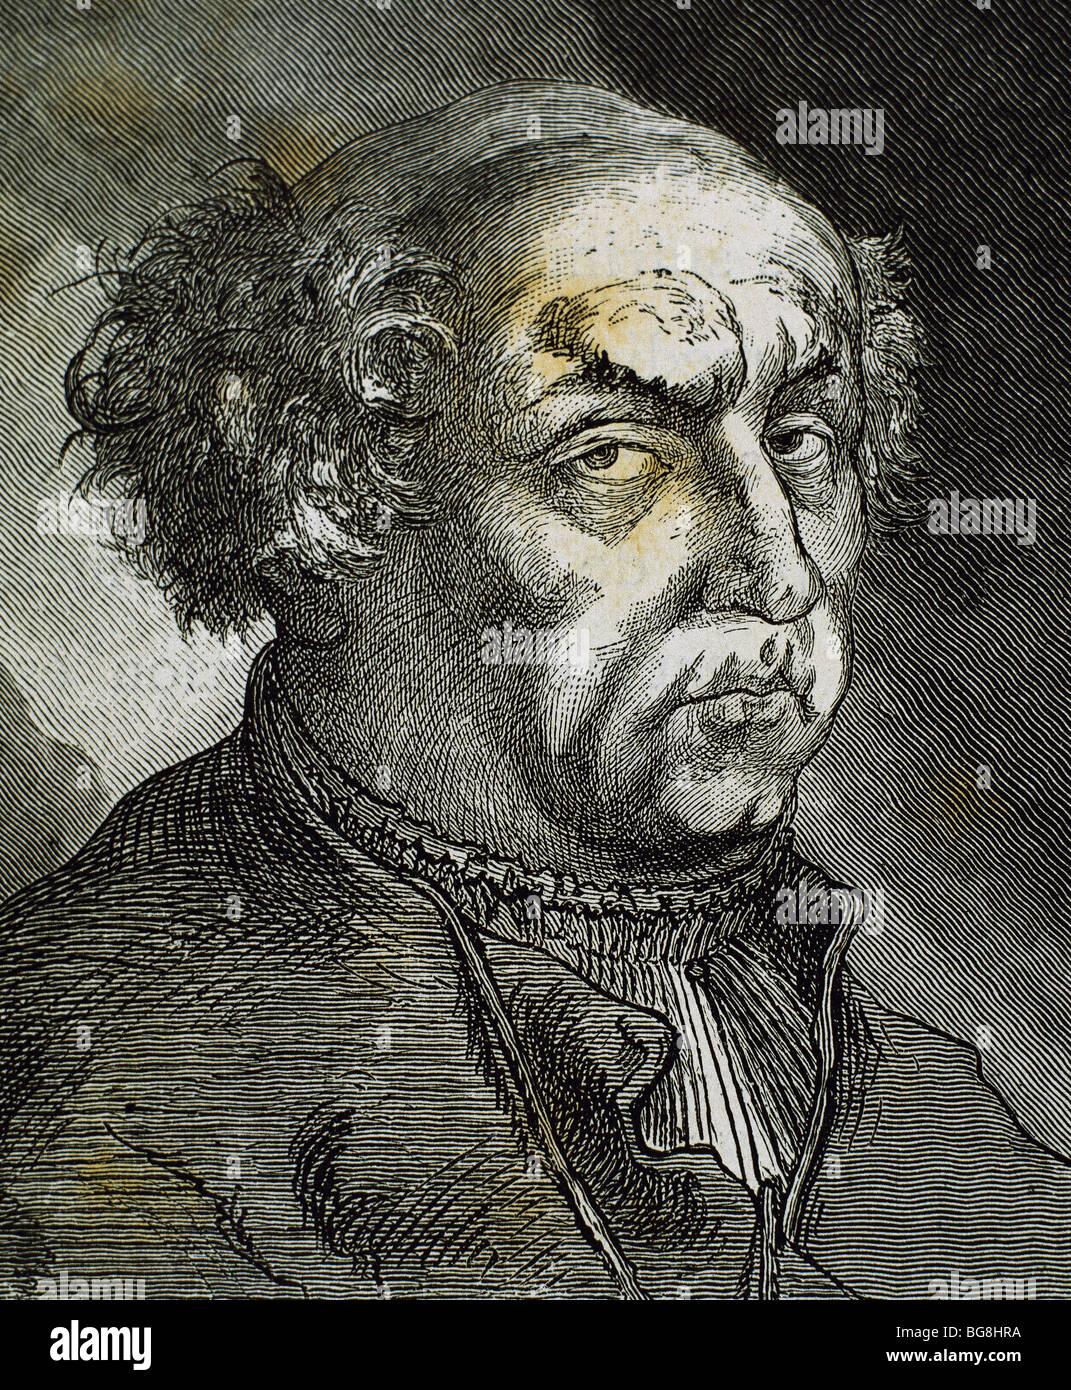 Paracelsus (1493-1541). Swiss physician, botanist, alchemist, astrologer, and general occultist. - Stock Image